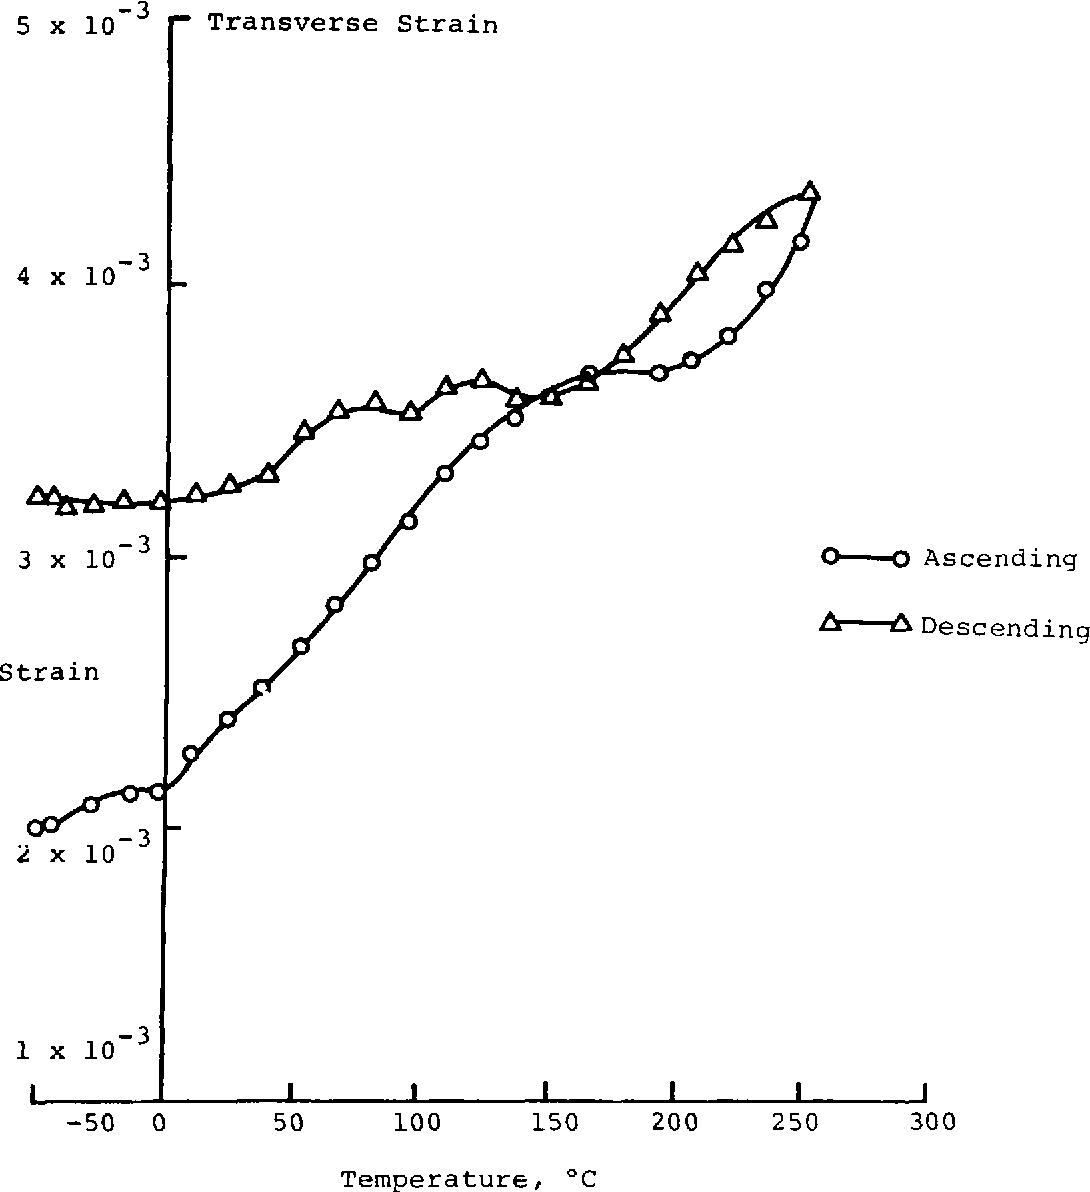 Figure 6. Transverse Strain versus Temperature Load = -1473 N (-150 kg) & = -35.37 MPa